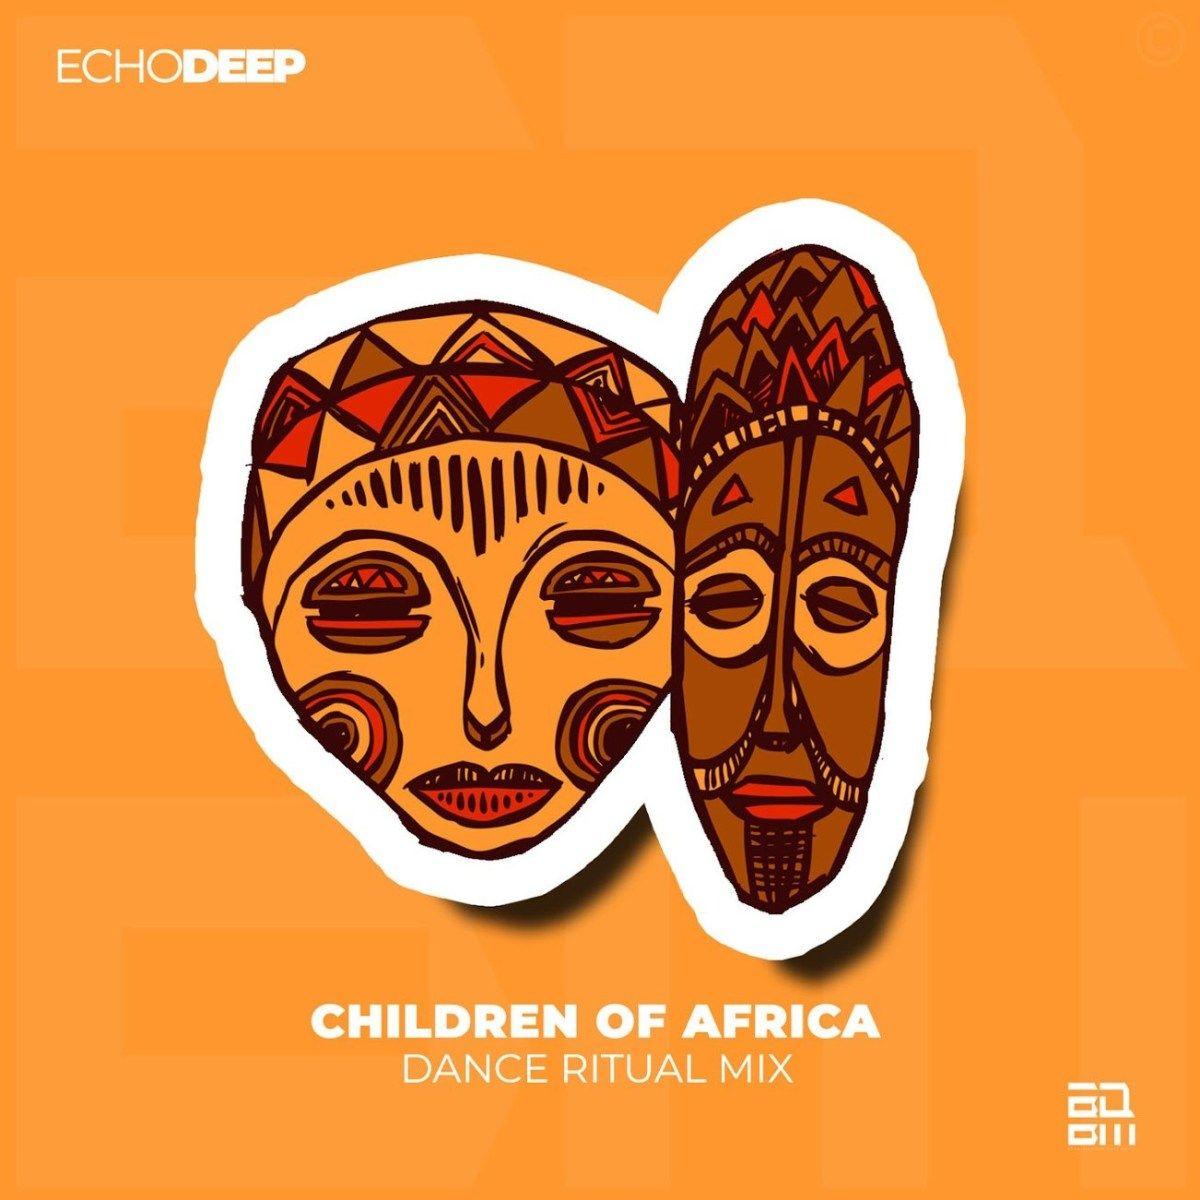 Echo Deep Children Of Africa Remix Africa, Remix, For